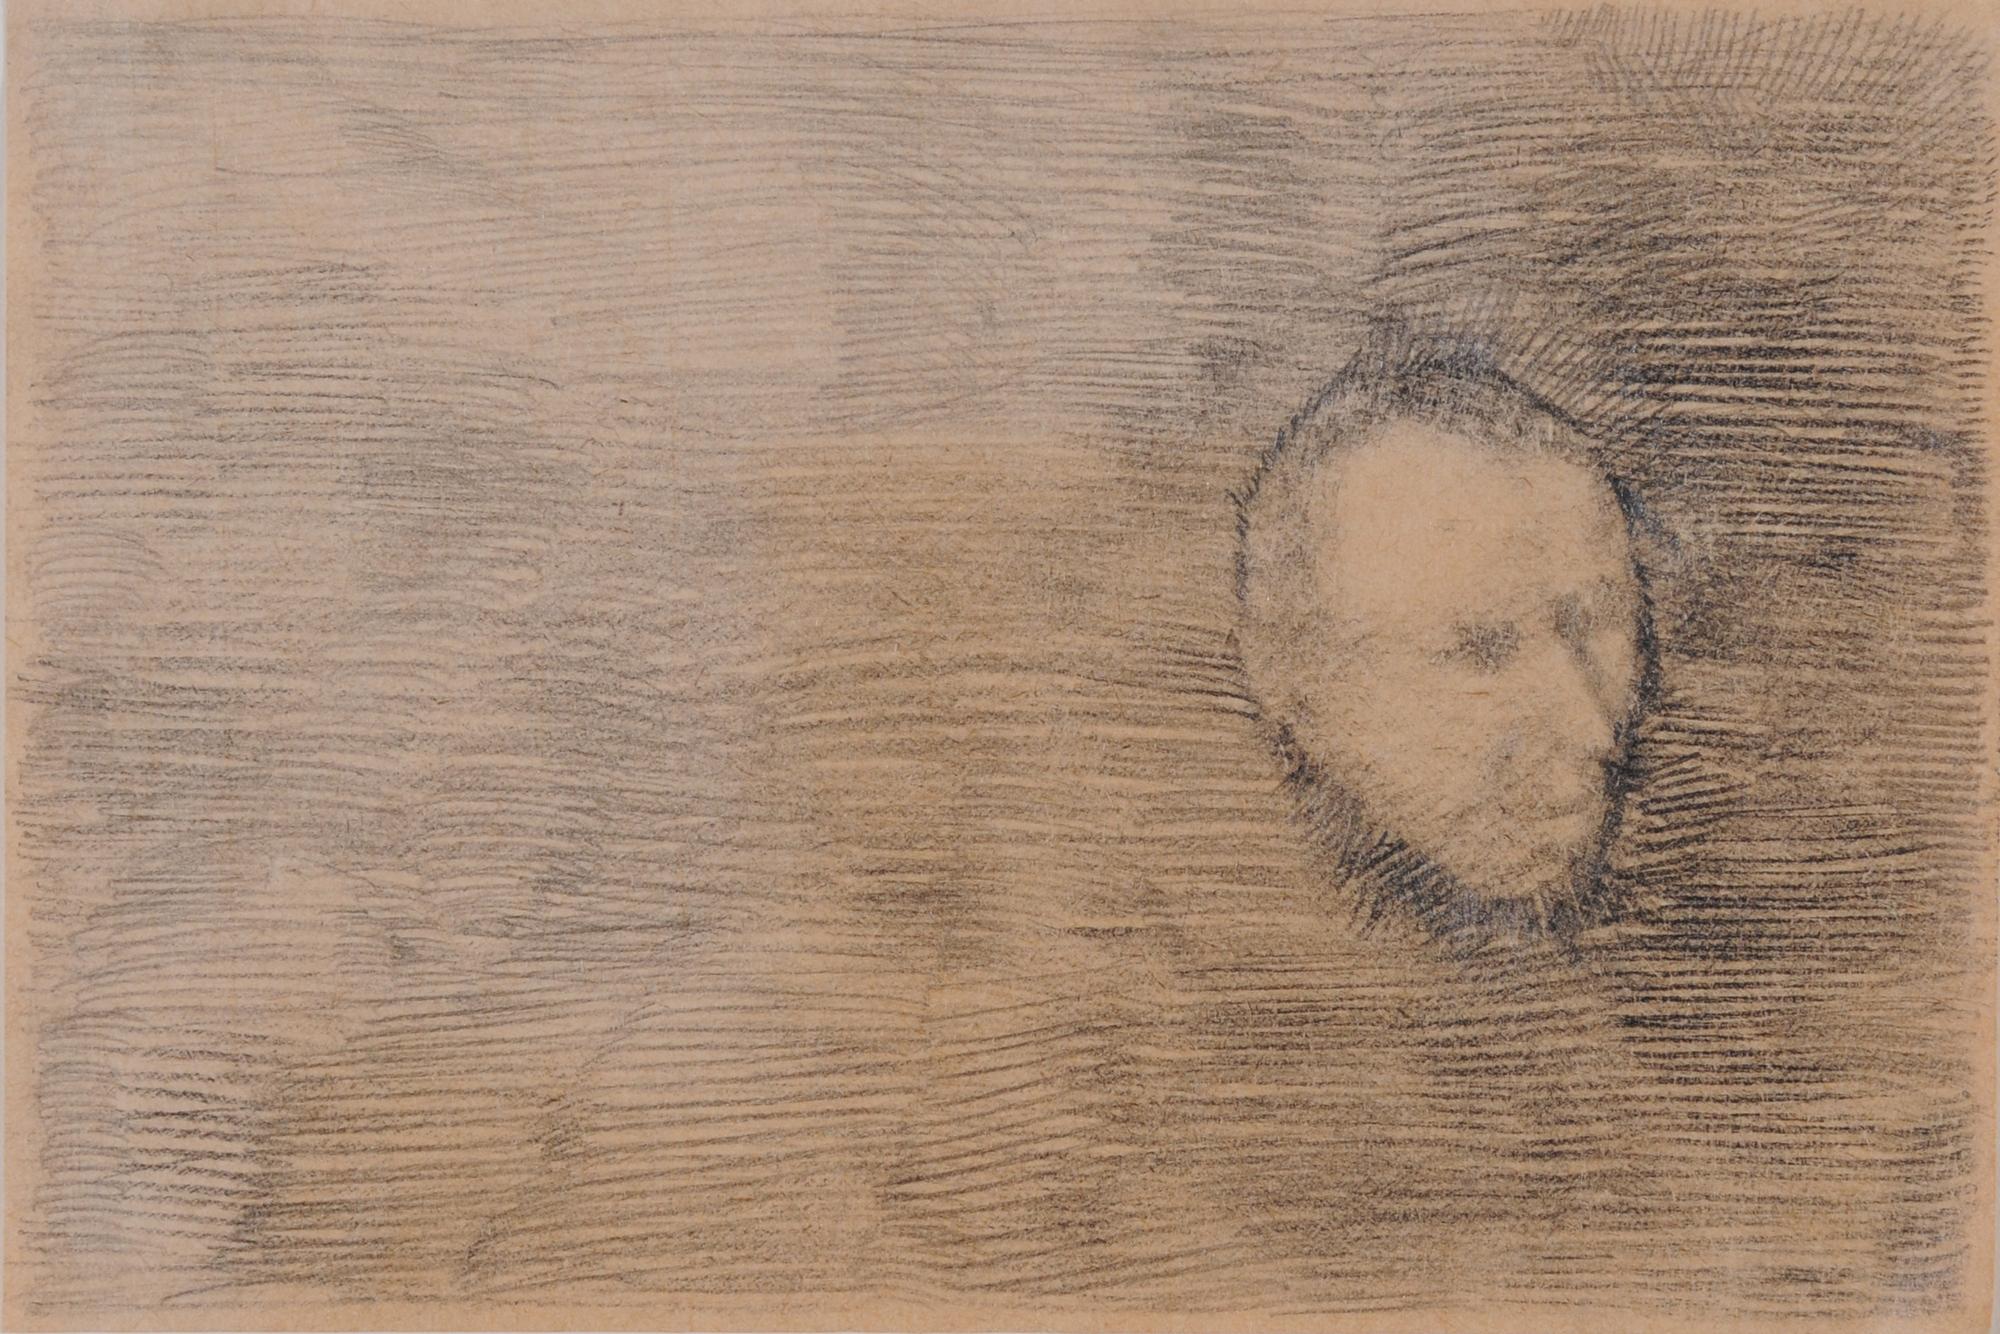 Avotins Janis, His Head